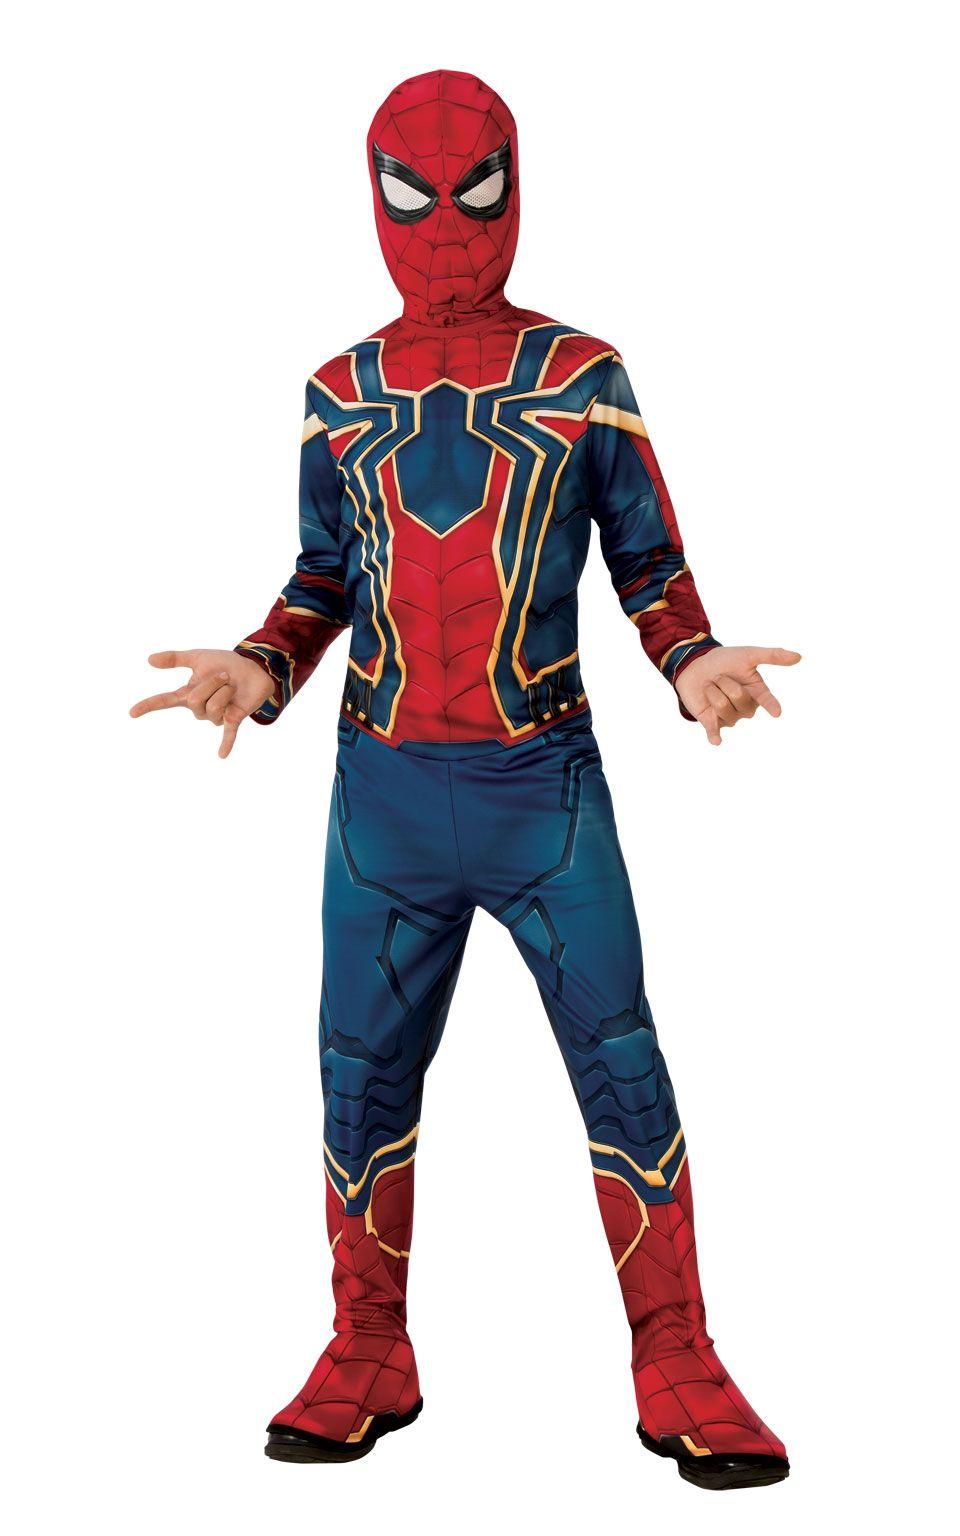 7851bf67fe9053 Gorilla and Man in Cage Costume - Superhero Costumes at Escapade™ UKghhjjhg